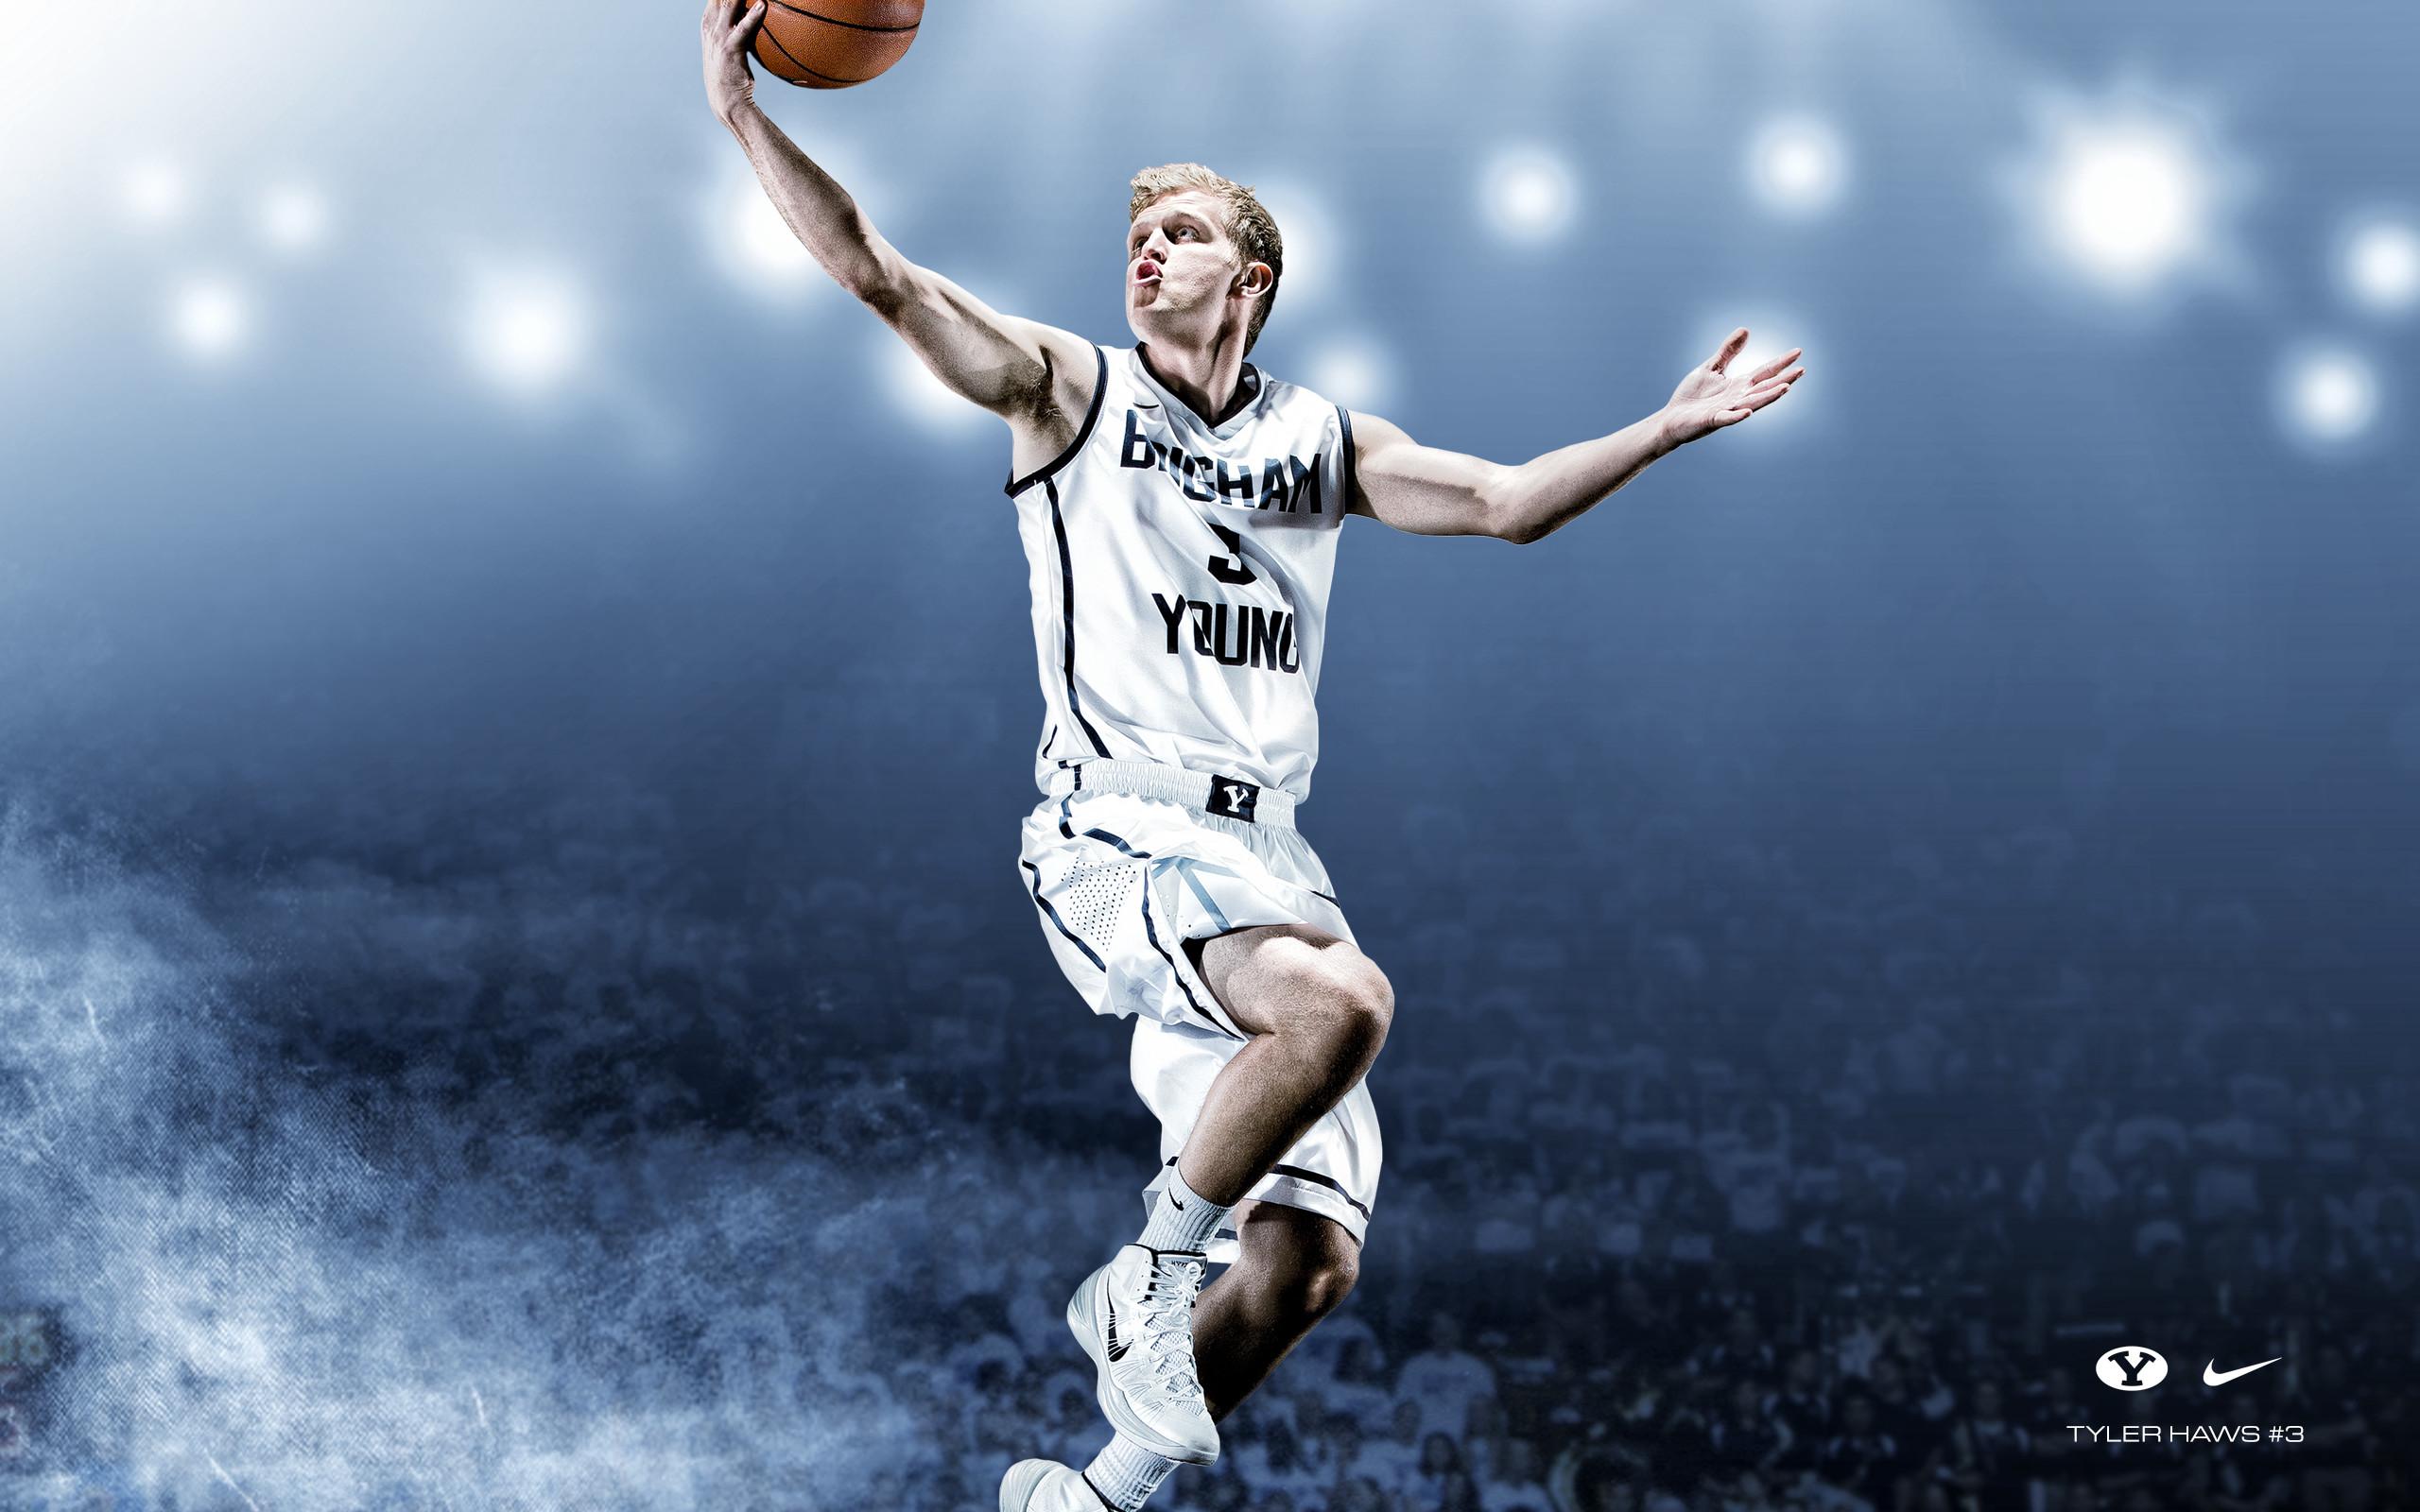 Uk Basketball: College Basketball Wallpaper ·①